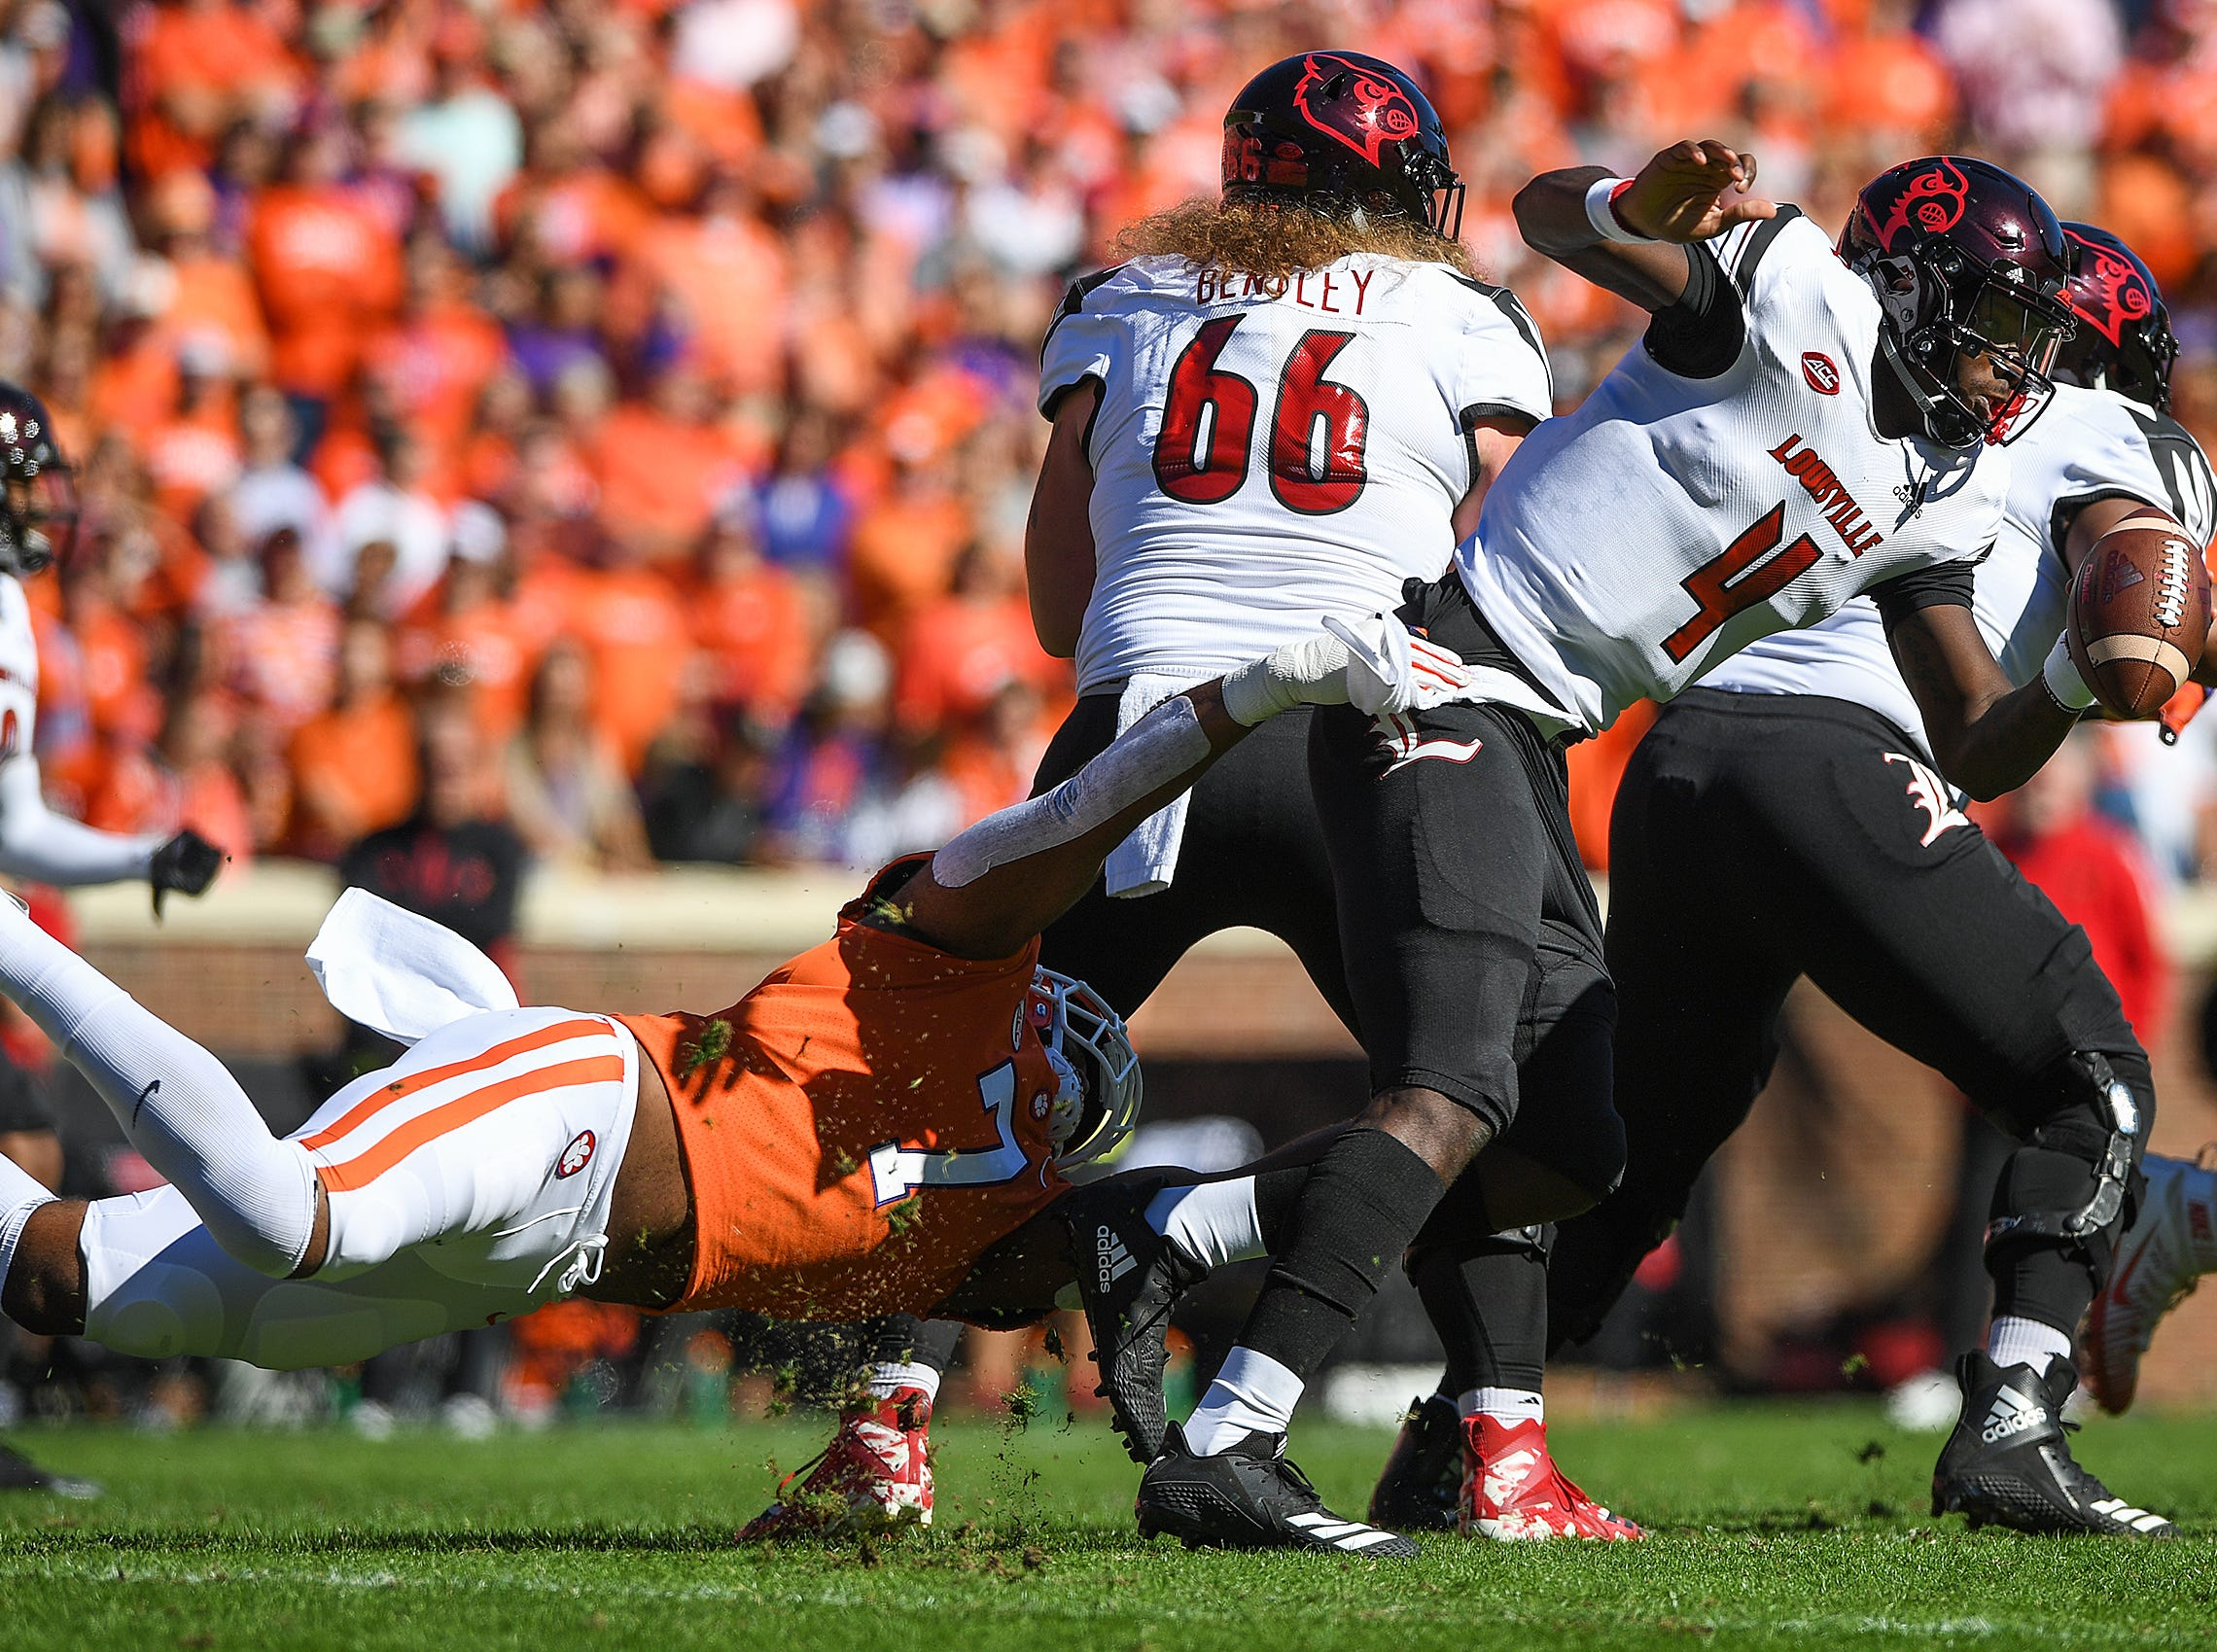 Clemson defensive lineman Austin Bryant (7) sacks Louisville quarterback Jawon Pass (4) during the 1st quarter Saturday, November 3, 2018 at Clemson's Memorial Stadium.